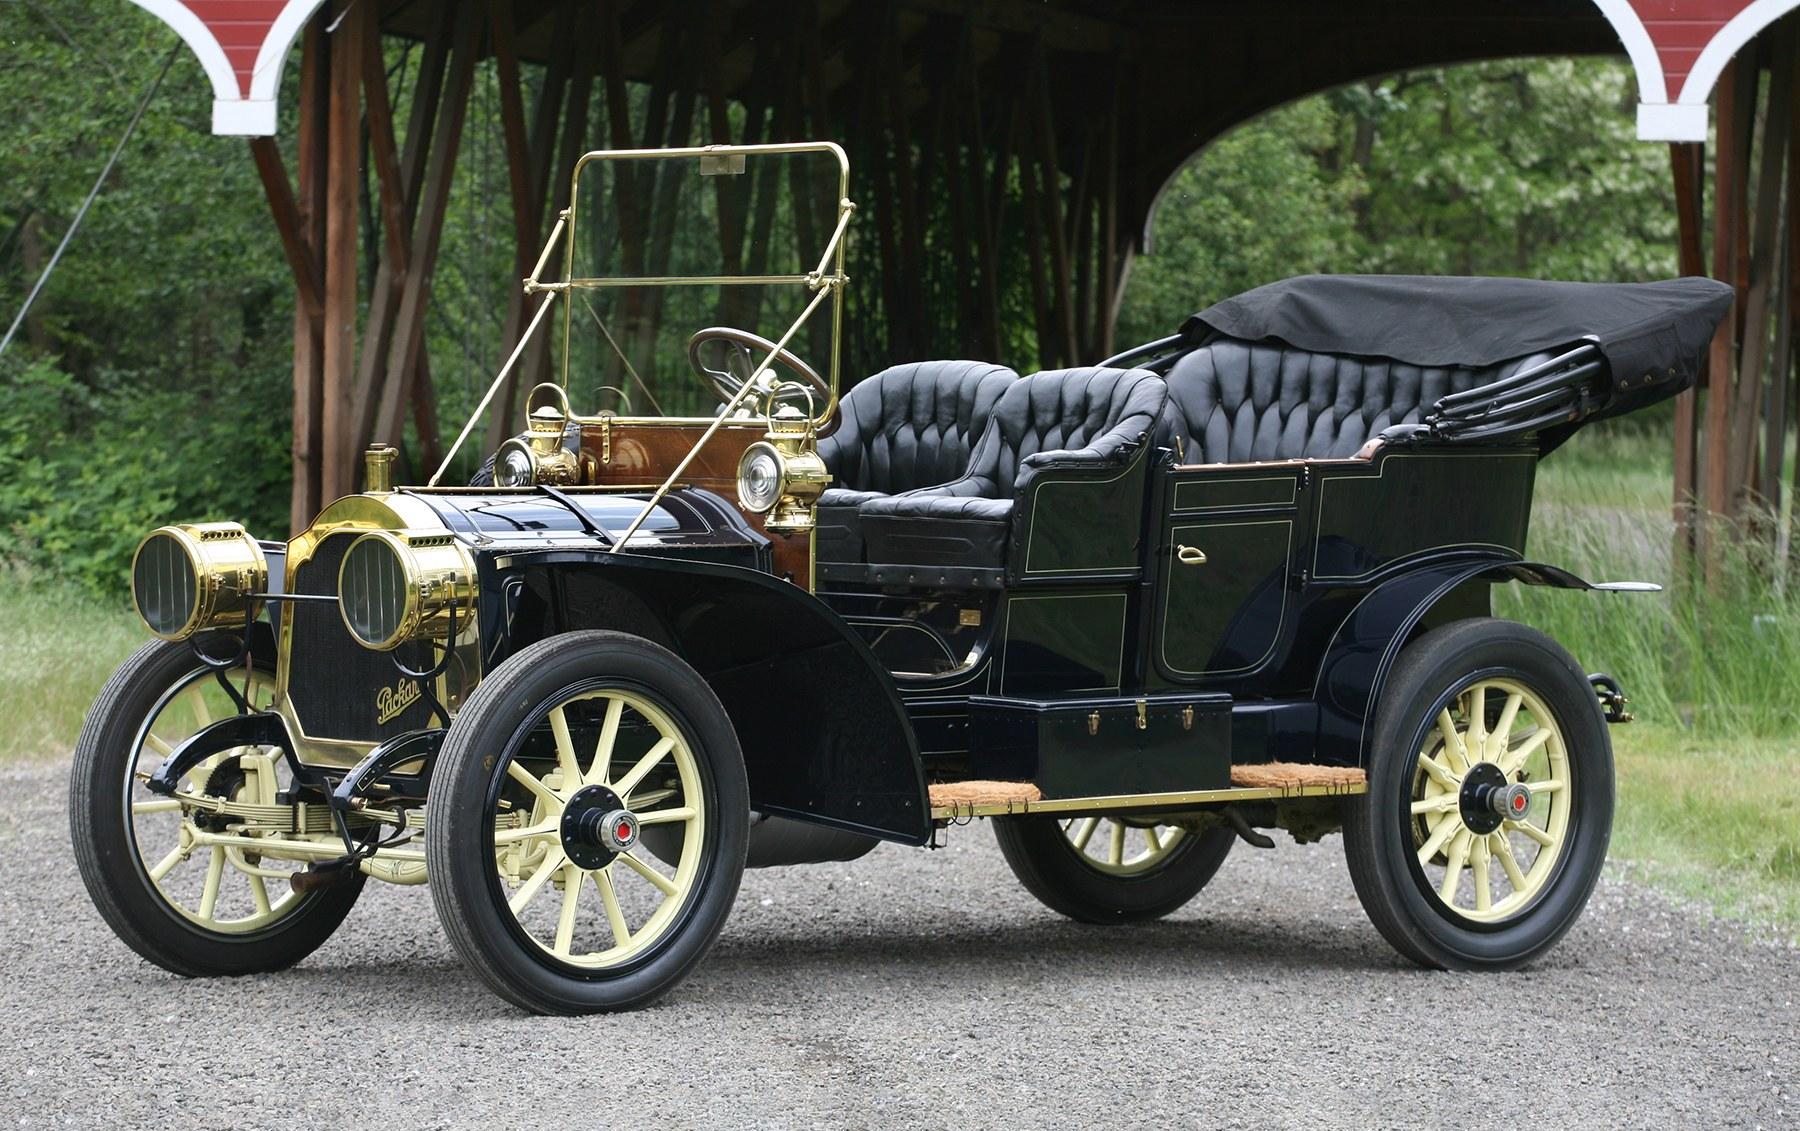 1908 Packard Model 30 Touring Car